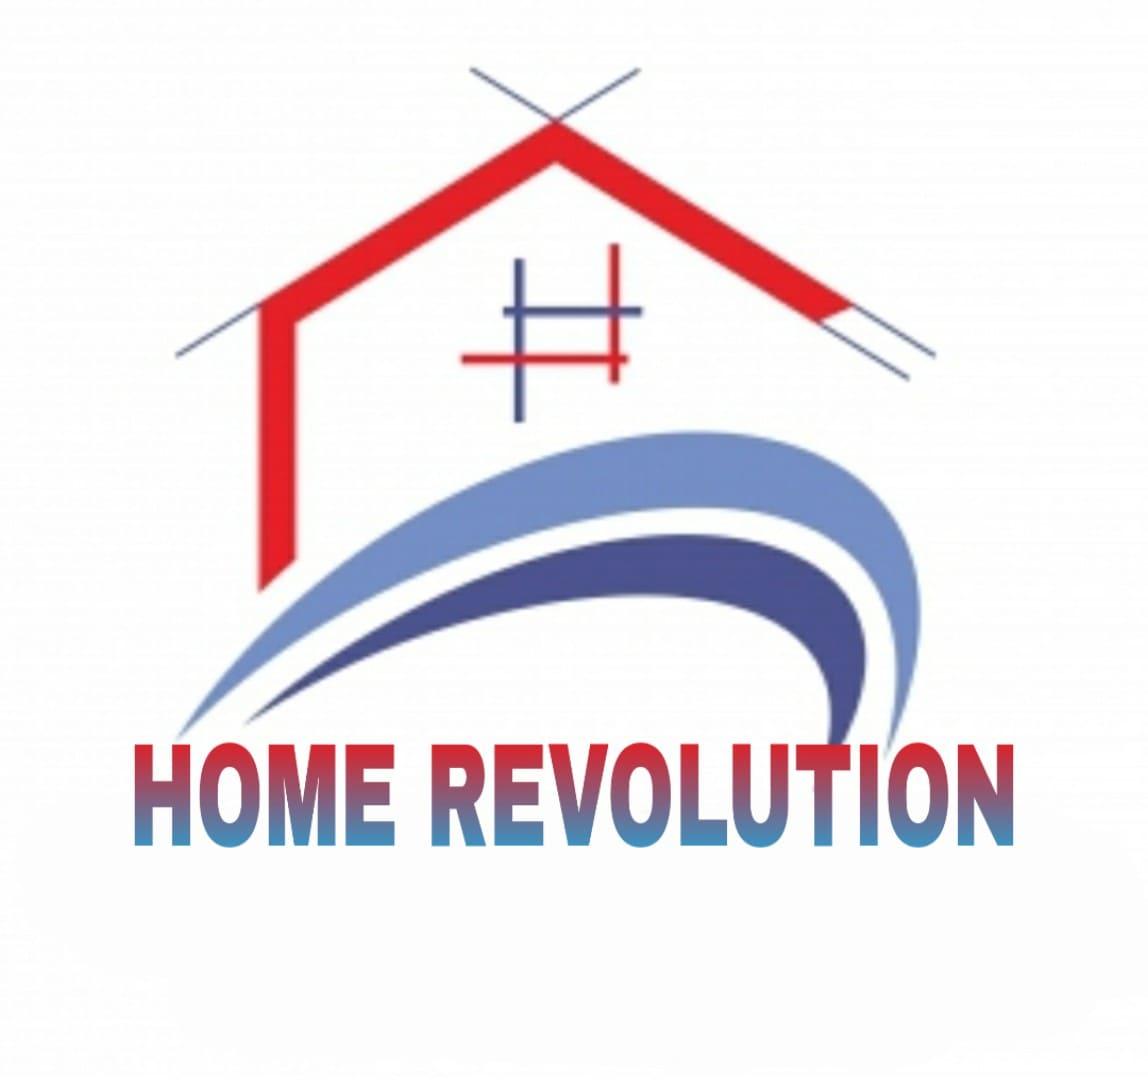 Home Revolution